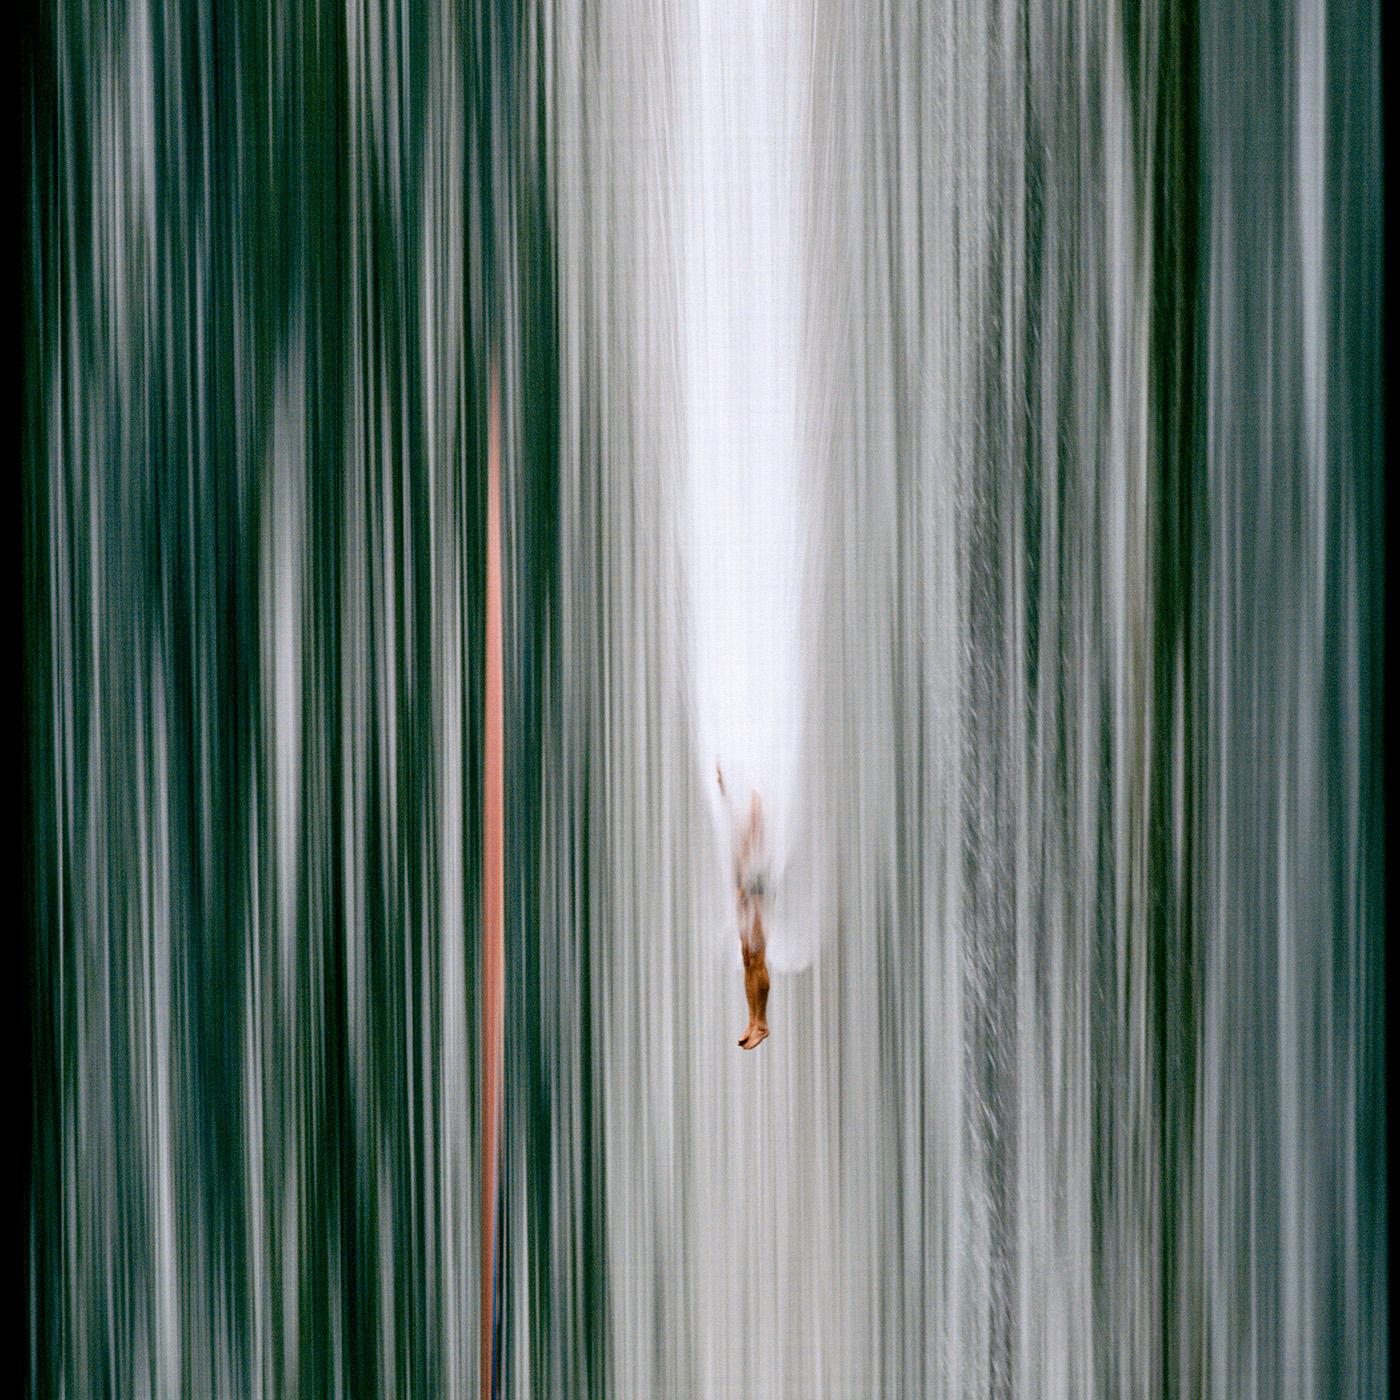 synchroballistic Red Bull Cliff Diving diving swim sports analog slit scan